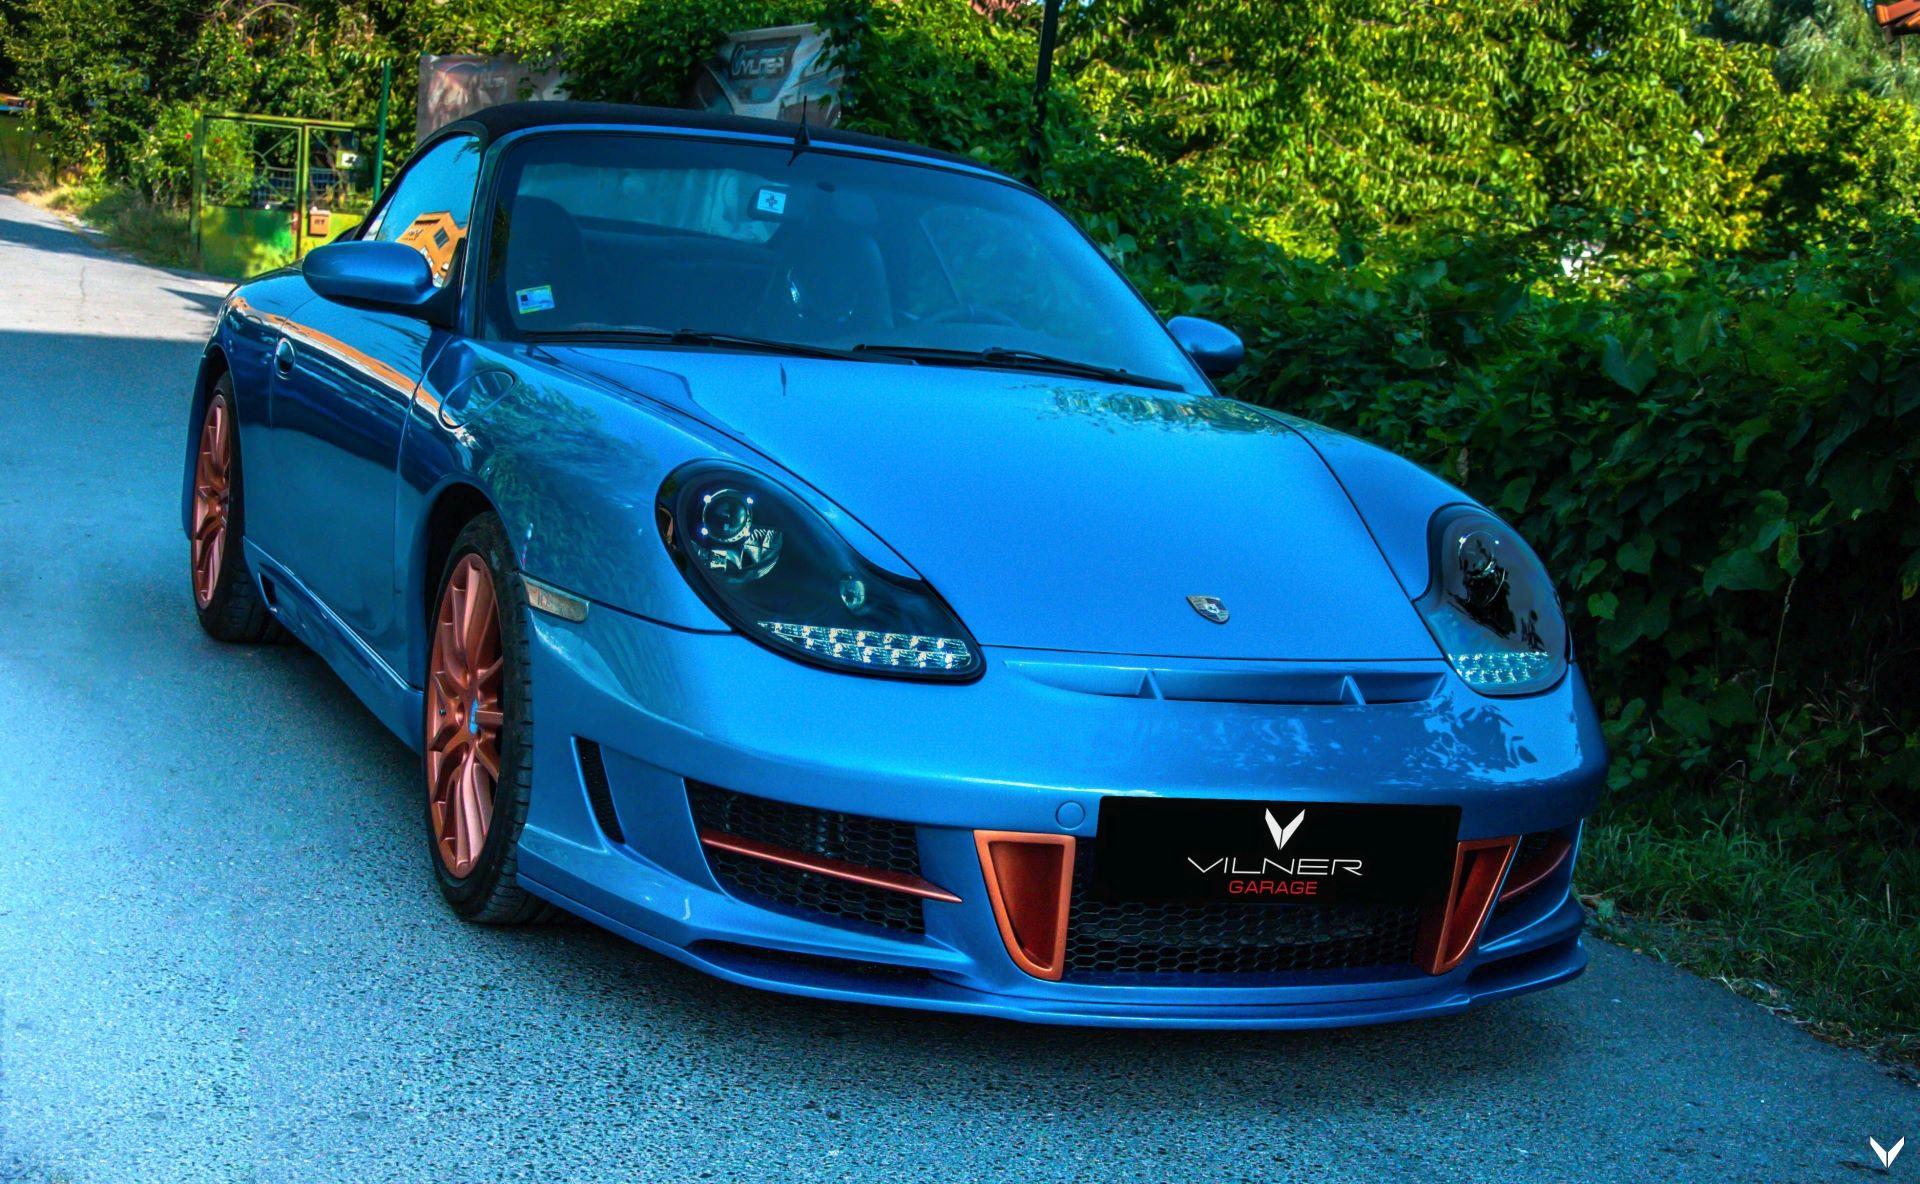 Porsche-911-Cabriolet-by-Vilner-37